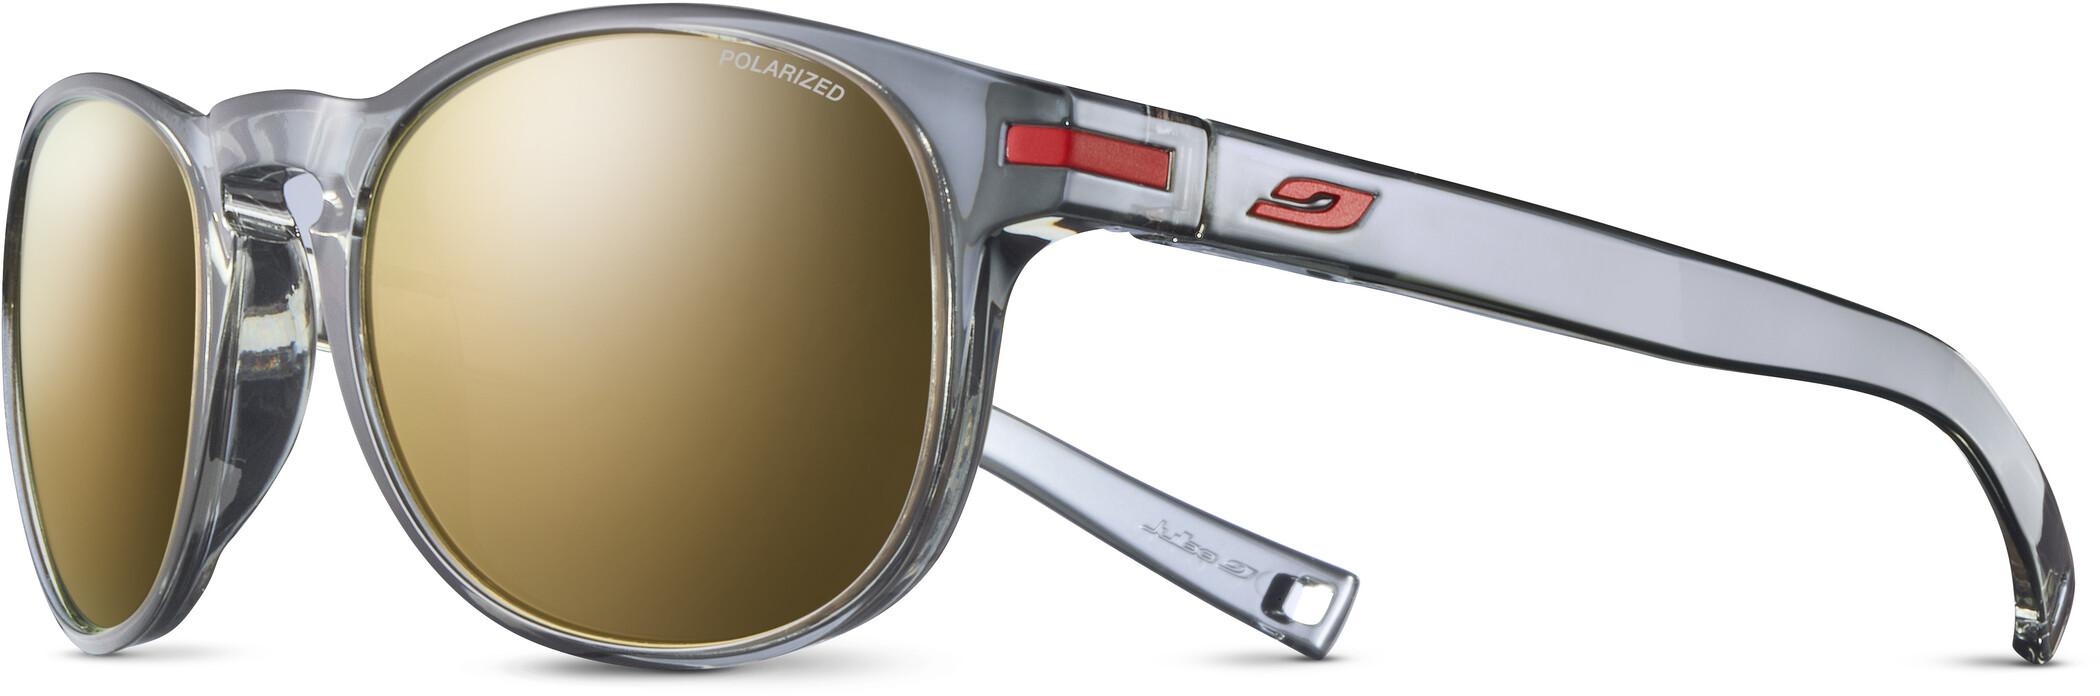 Julbo Valparaiso Polarized 3 Solbriller Herrer, shiny black/multilayer gold (2020) | Glasses